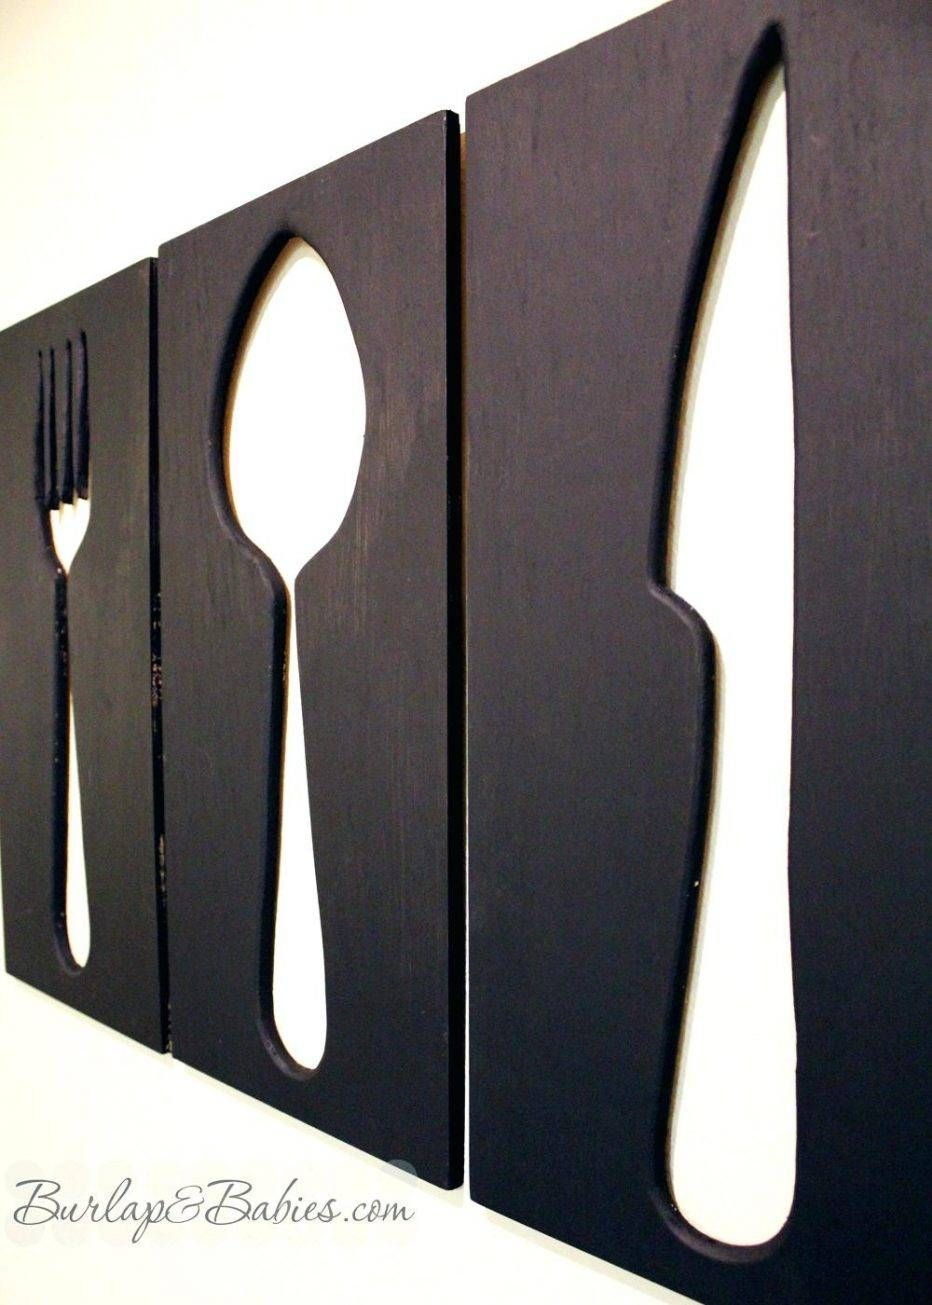 Wall Decor : Wall Interior Kitchen Utensils Wall Art Kitchen Throughout Latest Large Utensil Wall Art (View 16 of 20)